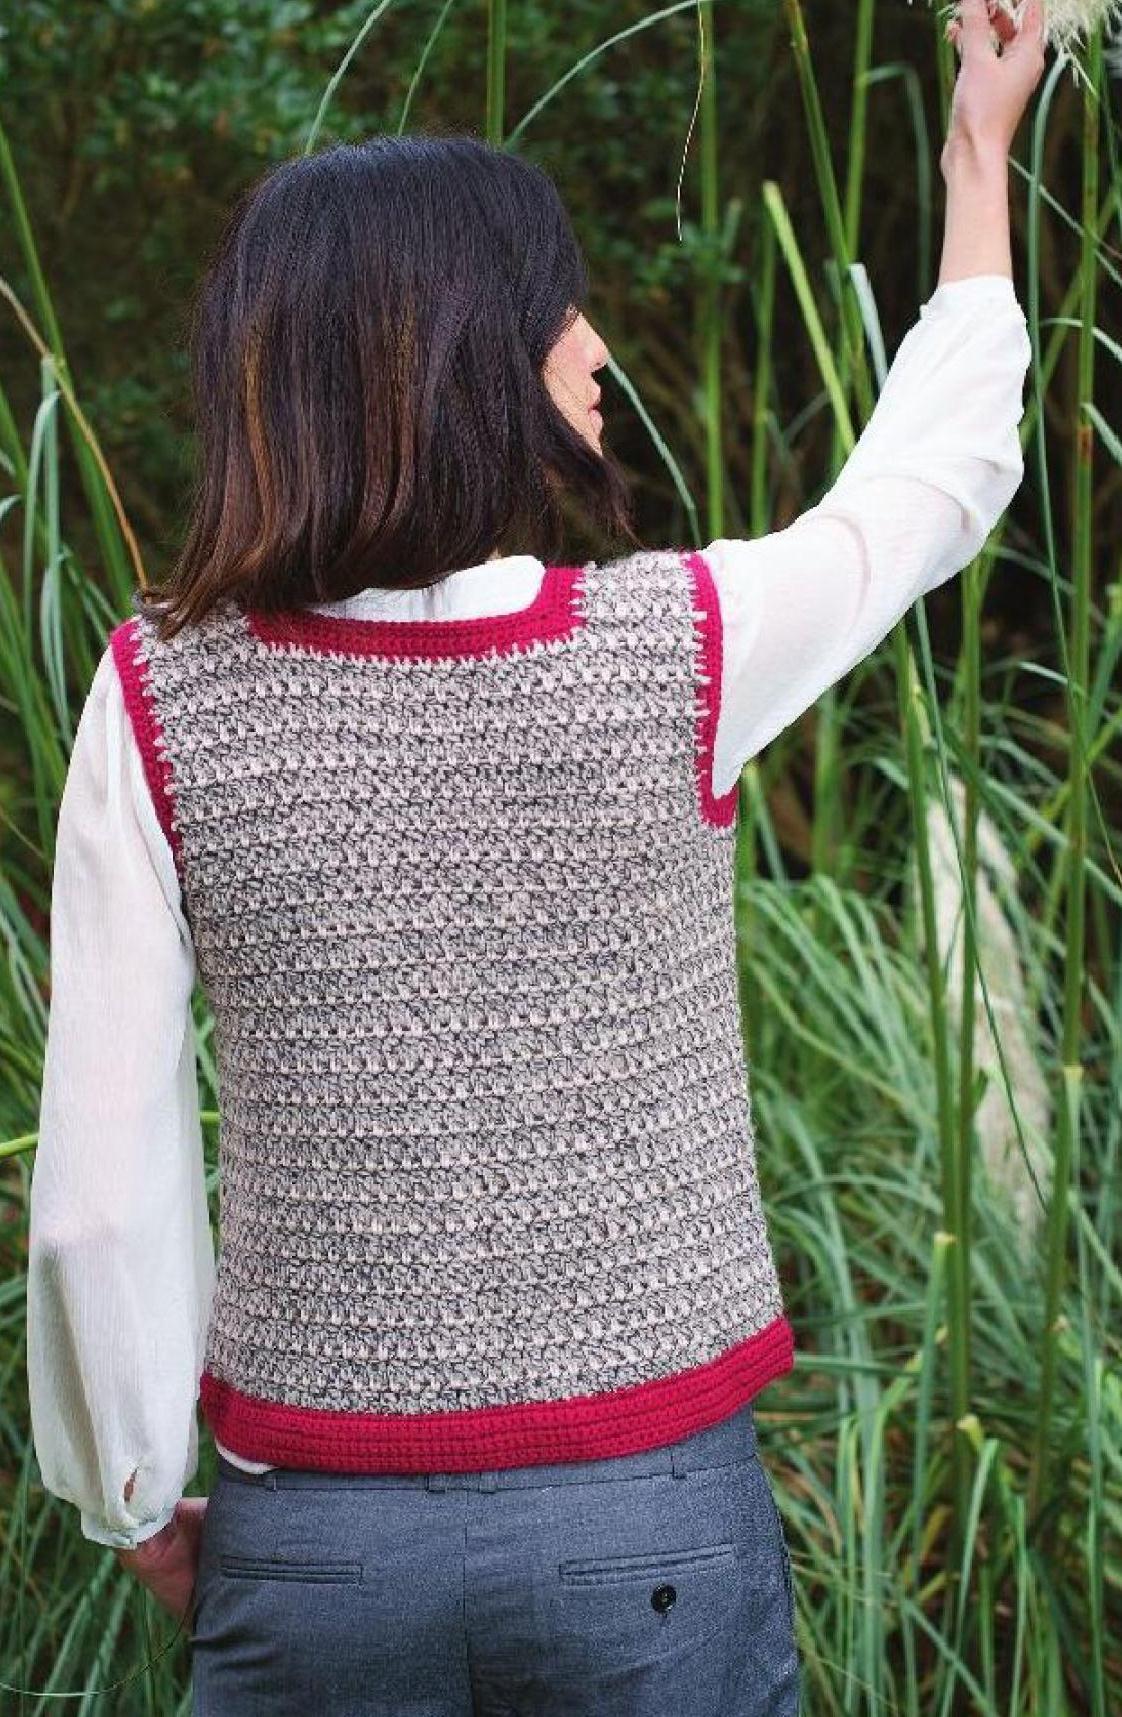 0882_Inside Crochet 15_077 (3)